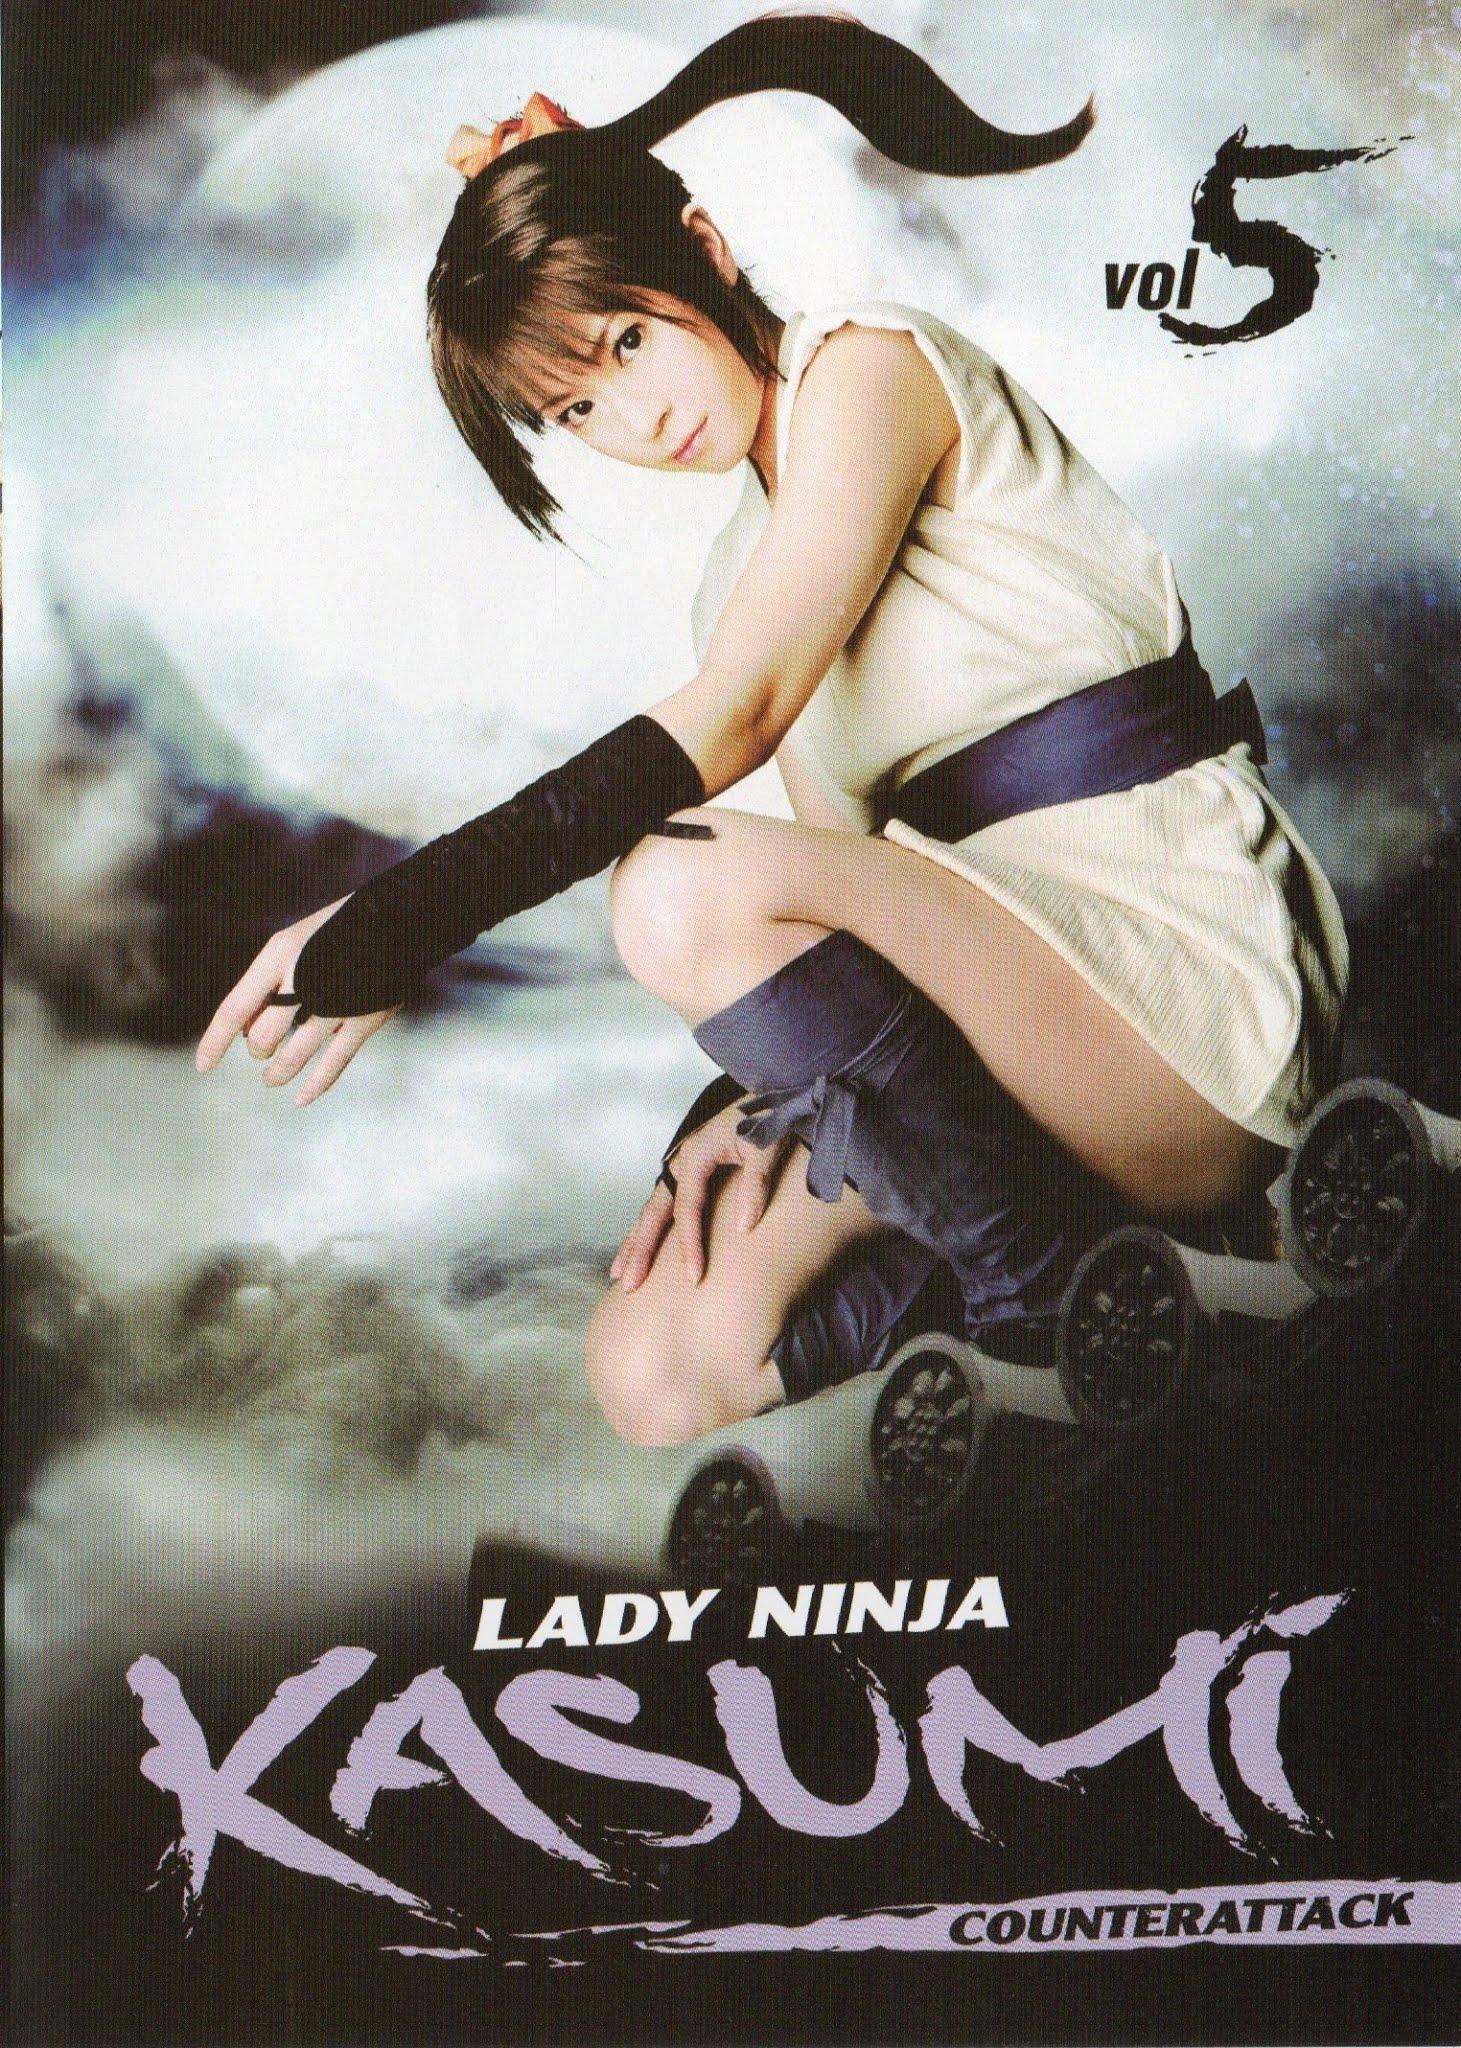 Lady Ninja Kasumi: Vol. 5 2008